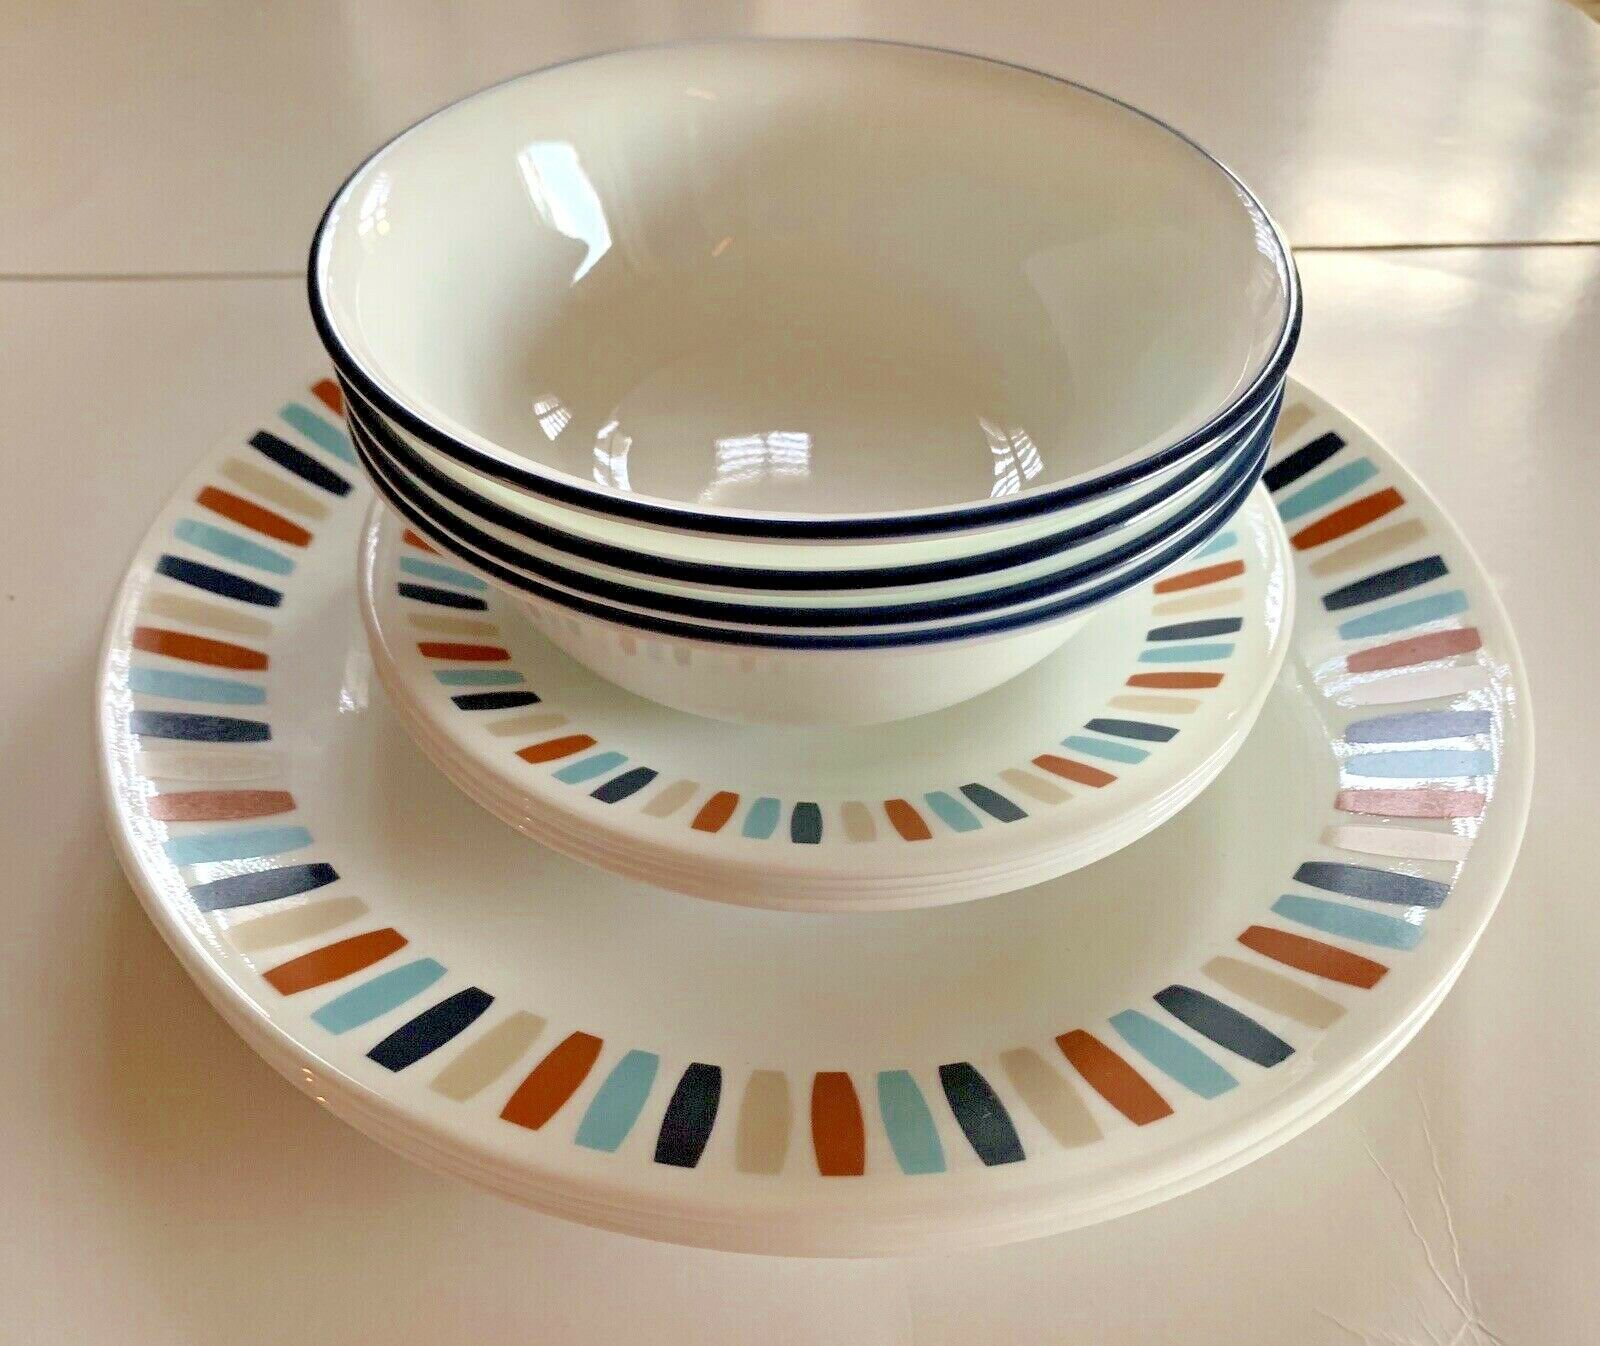 Corelle Livingware Payden Pattern Dinnerware  - Dinnerware - Ideas of Dinnerware #Dinnerware #casualdinnerware Corelle Livingware Payden Pattern Dinnerware  - Dinnerware - Ideas of Dinnerware #Dinnerware #casualdinnerware